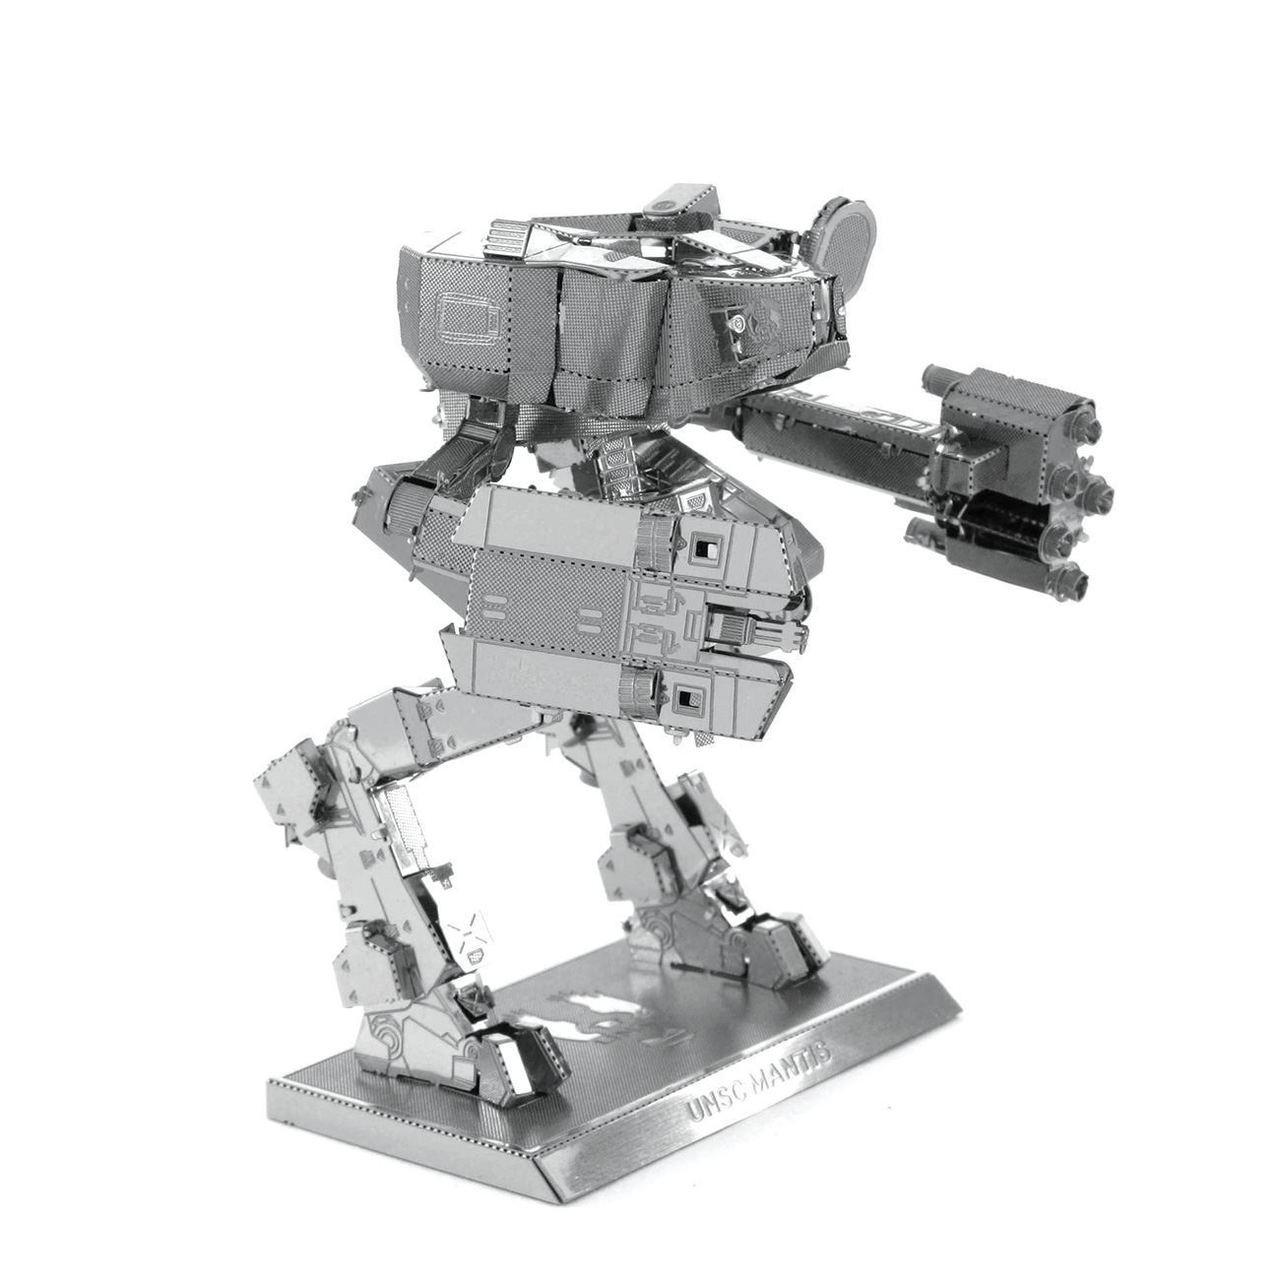 HALO Free Shipping!! UNSC Mantis Metal Earth 3D Metal Model Kit